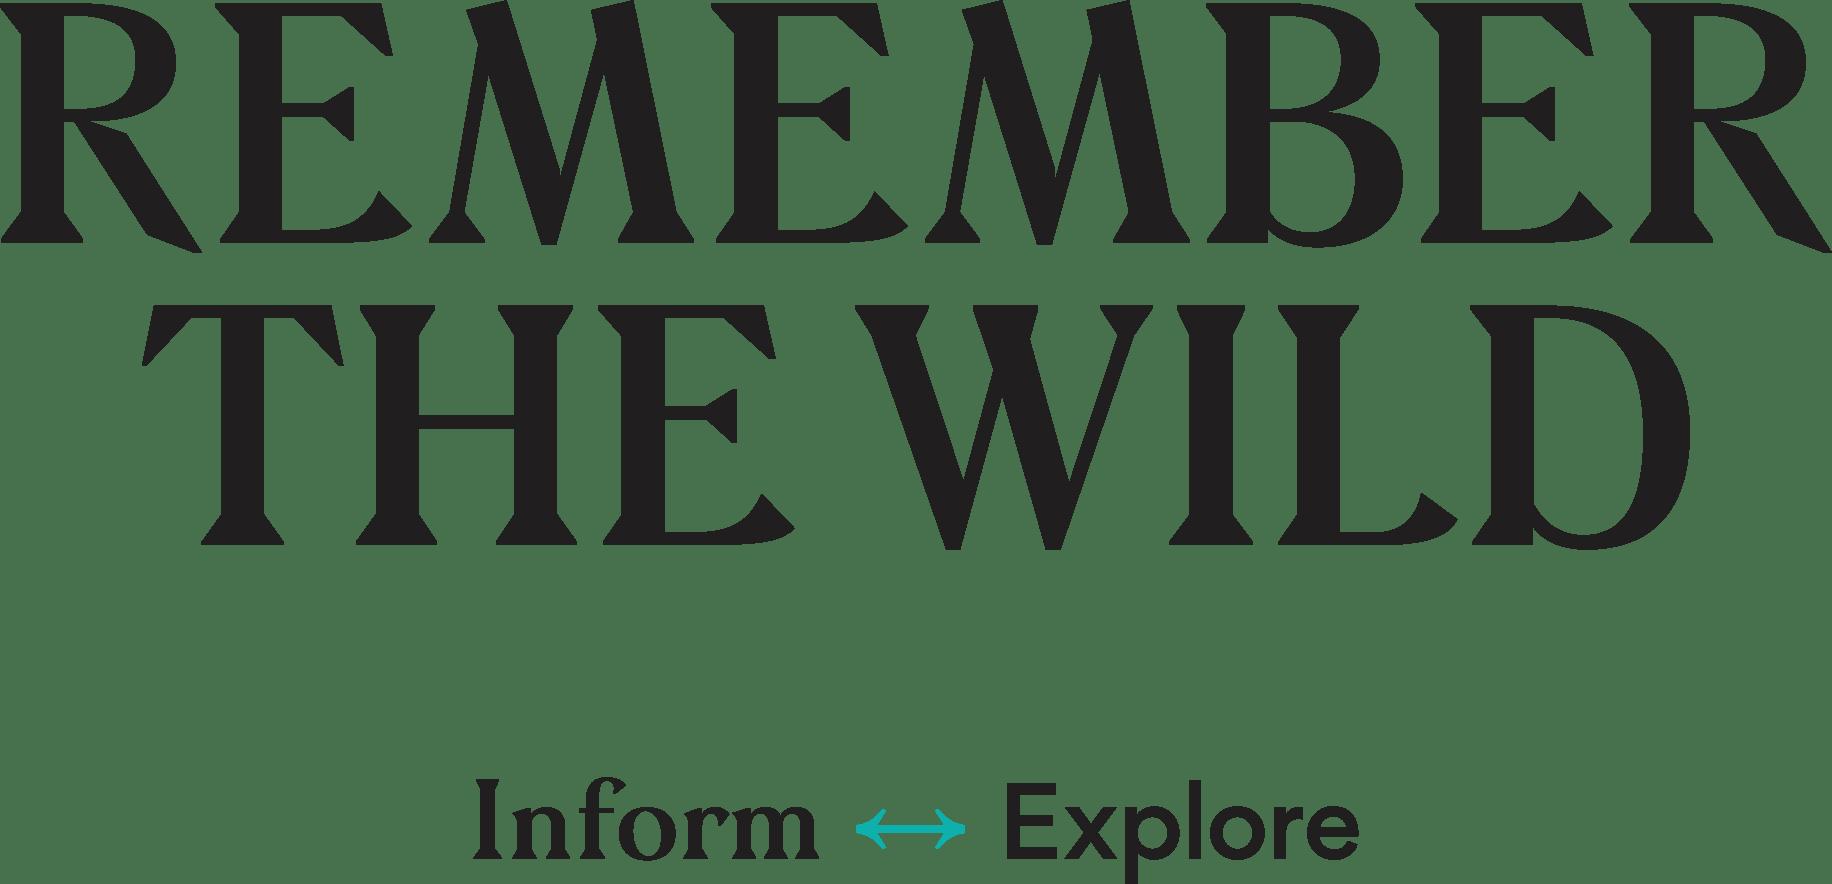 Remember the Wild logo